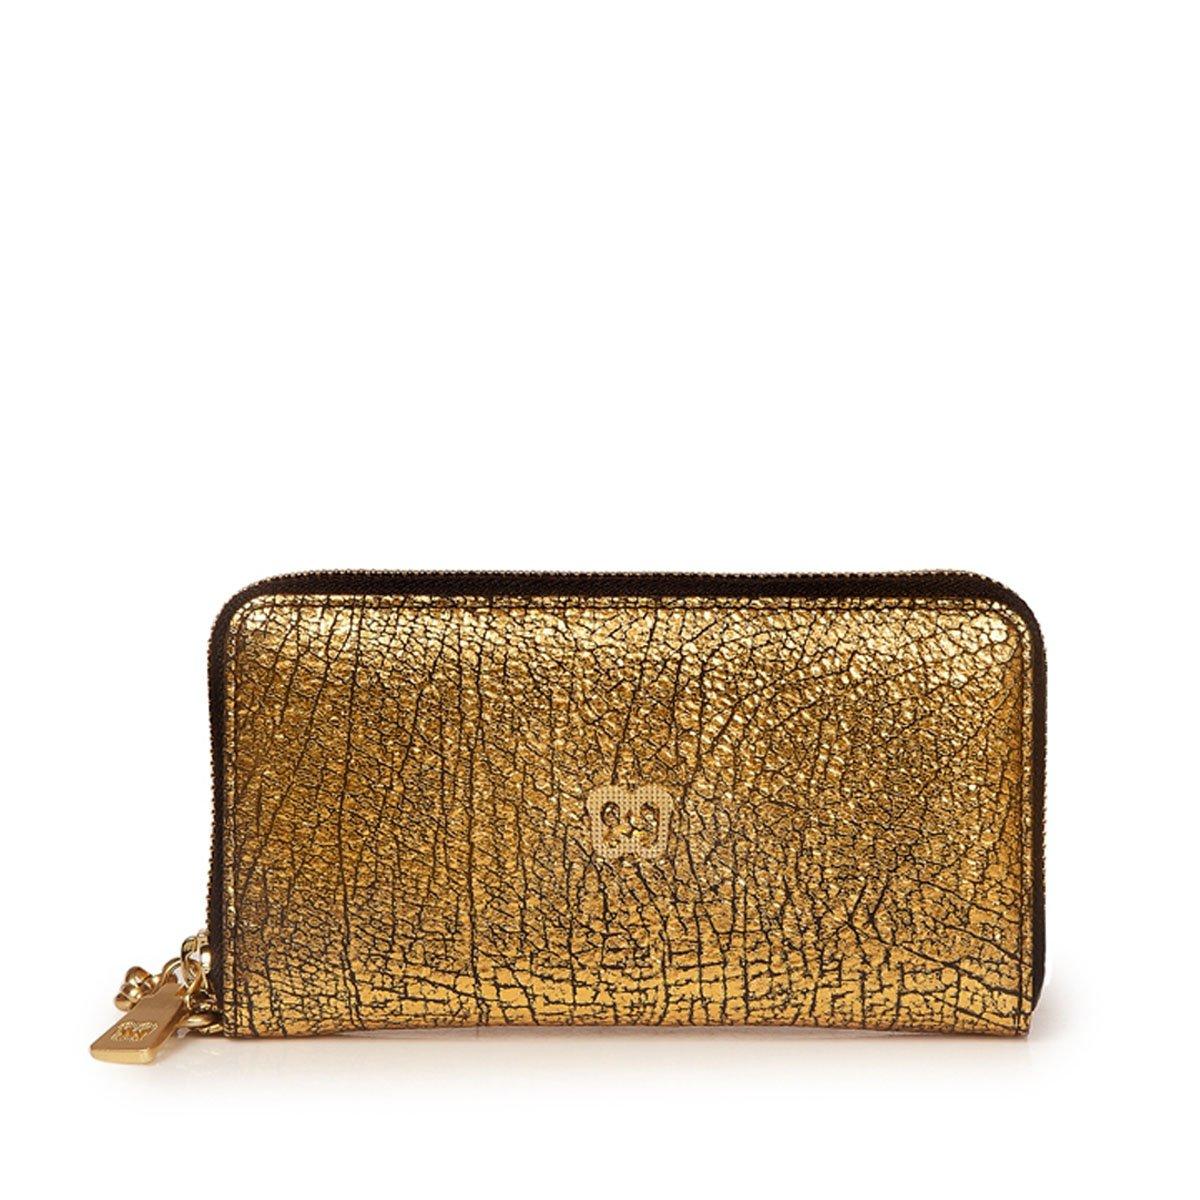 Eric Javits Luxury Fashion Designer Women's Handbag - Smartphone Wristlet - Gold